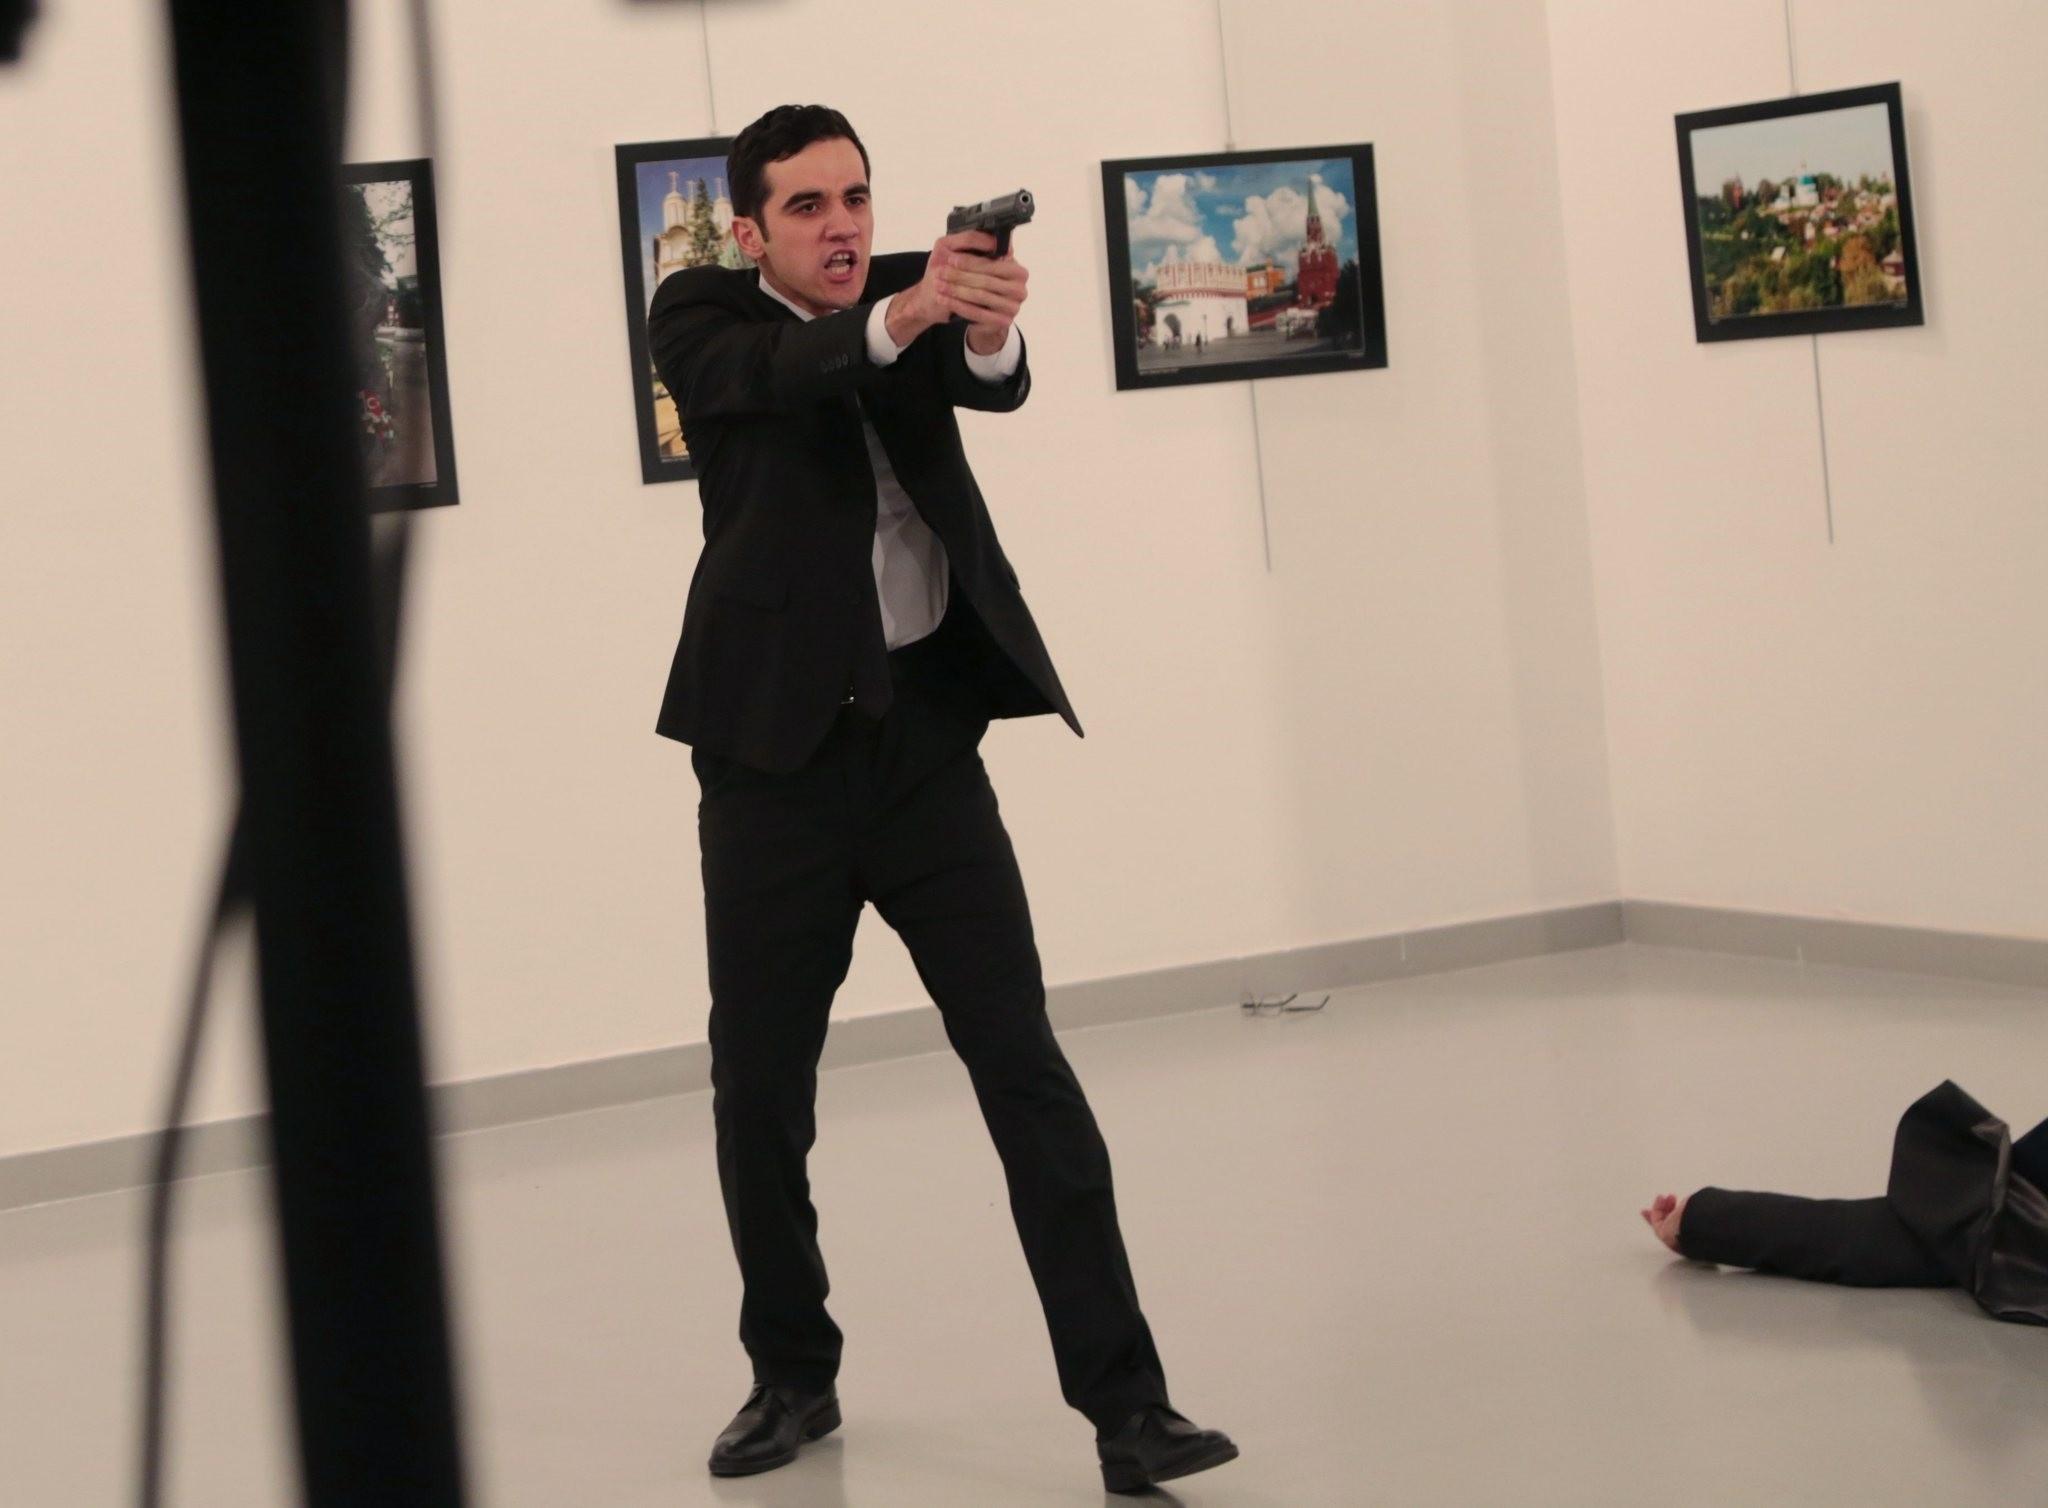 Altu0131ntau015f gestures after shooting the Russian Ambassador to Turkey, Andrei Karlov, at a photo gallery in Ankara, Dec. 19, 2016. (AP Photo)